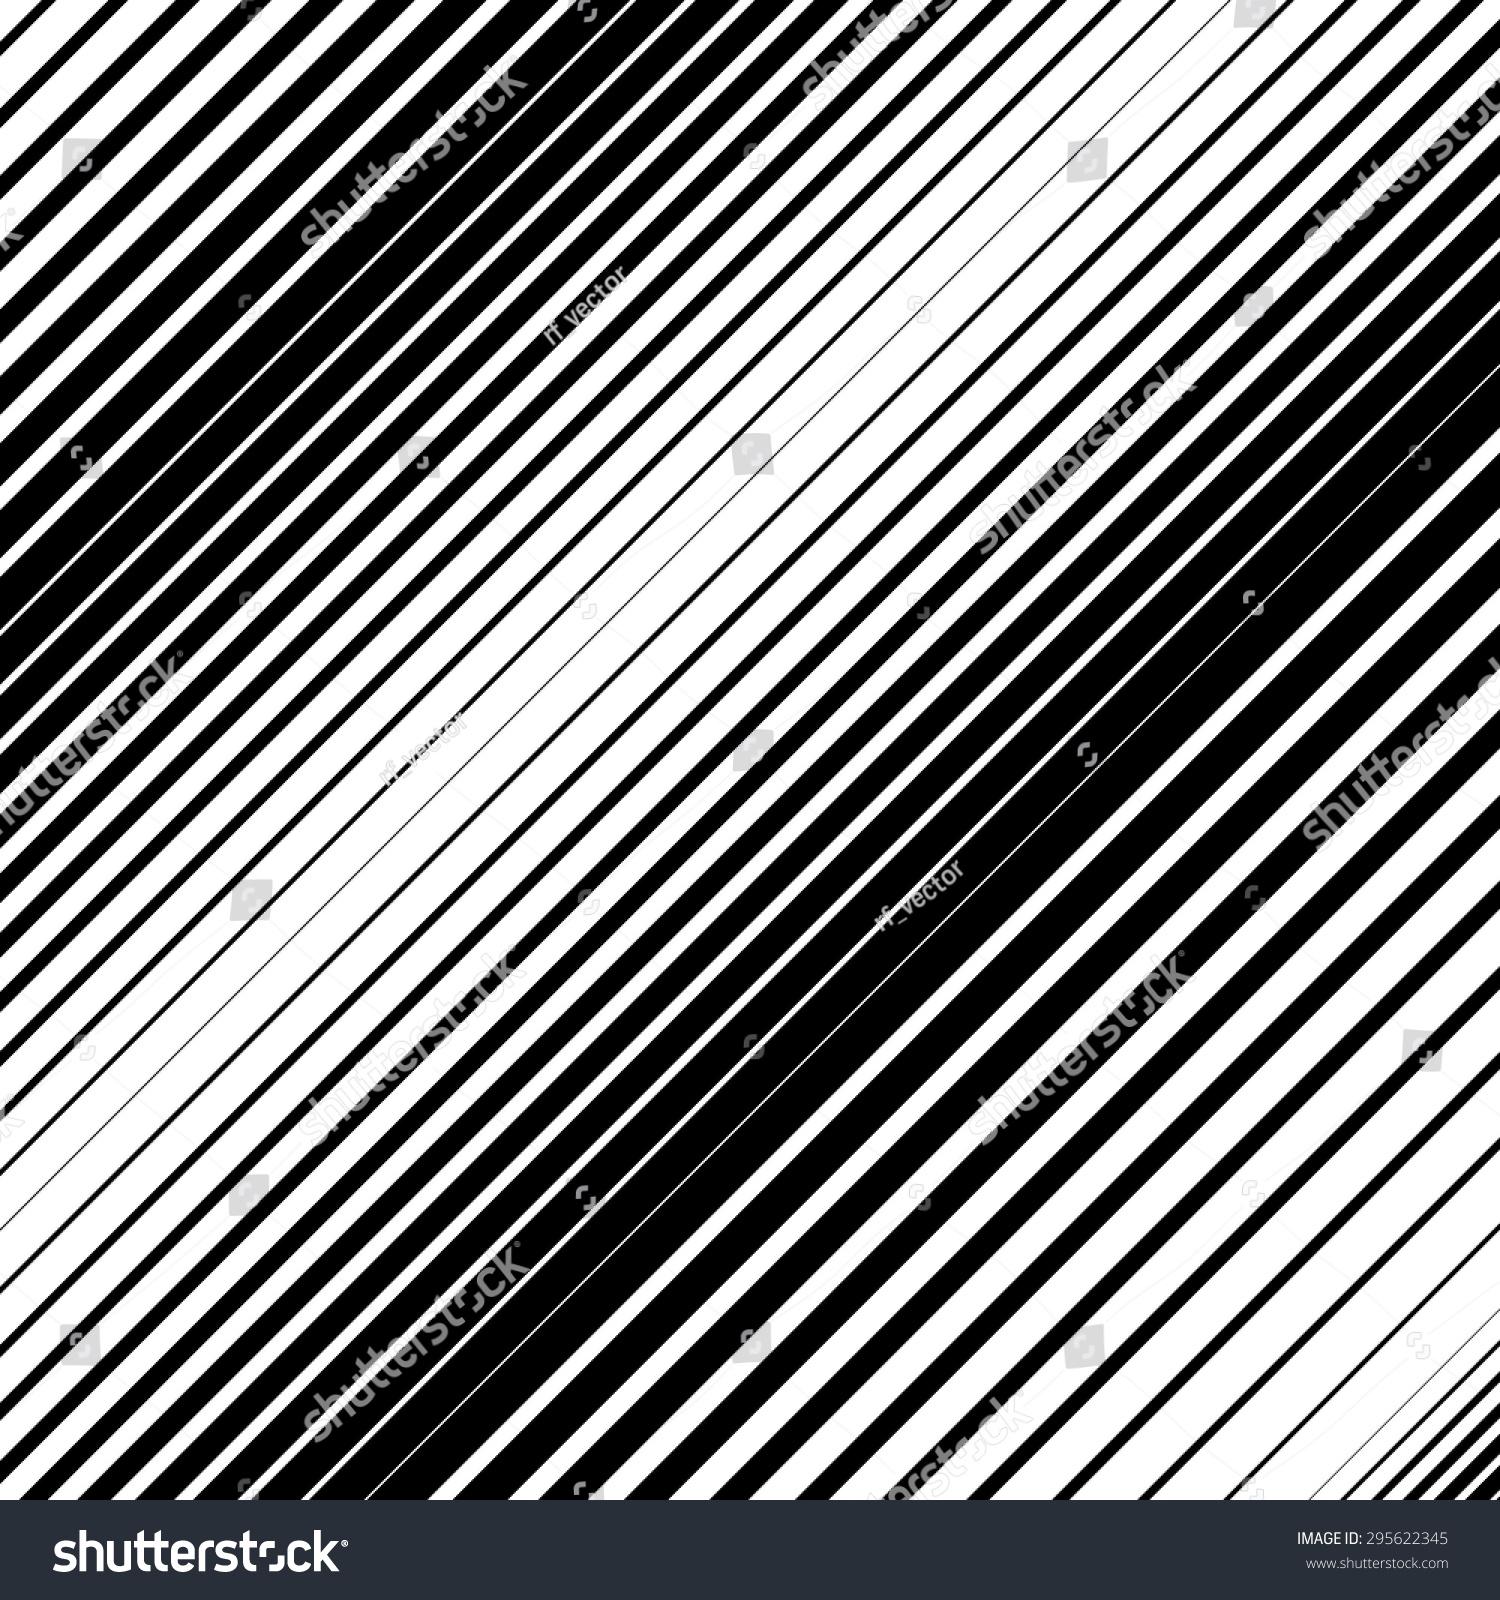 Line Texture Pattern : Parallel diagonal slanting lines texture pattern stock